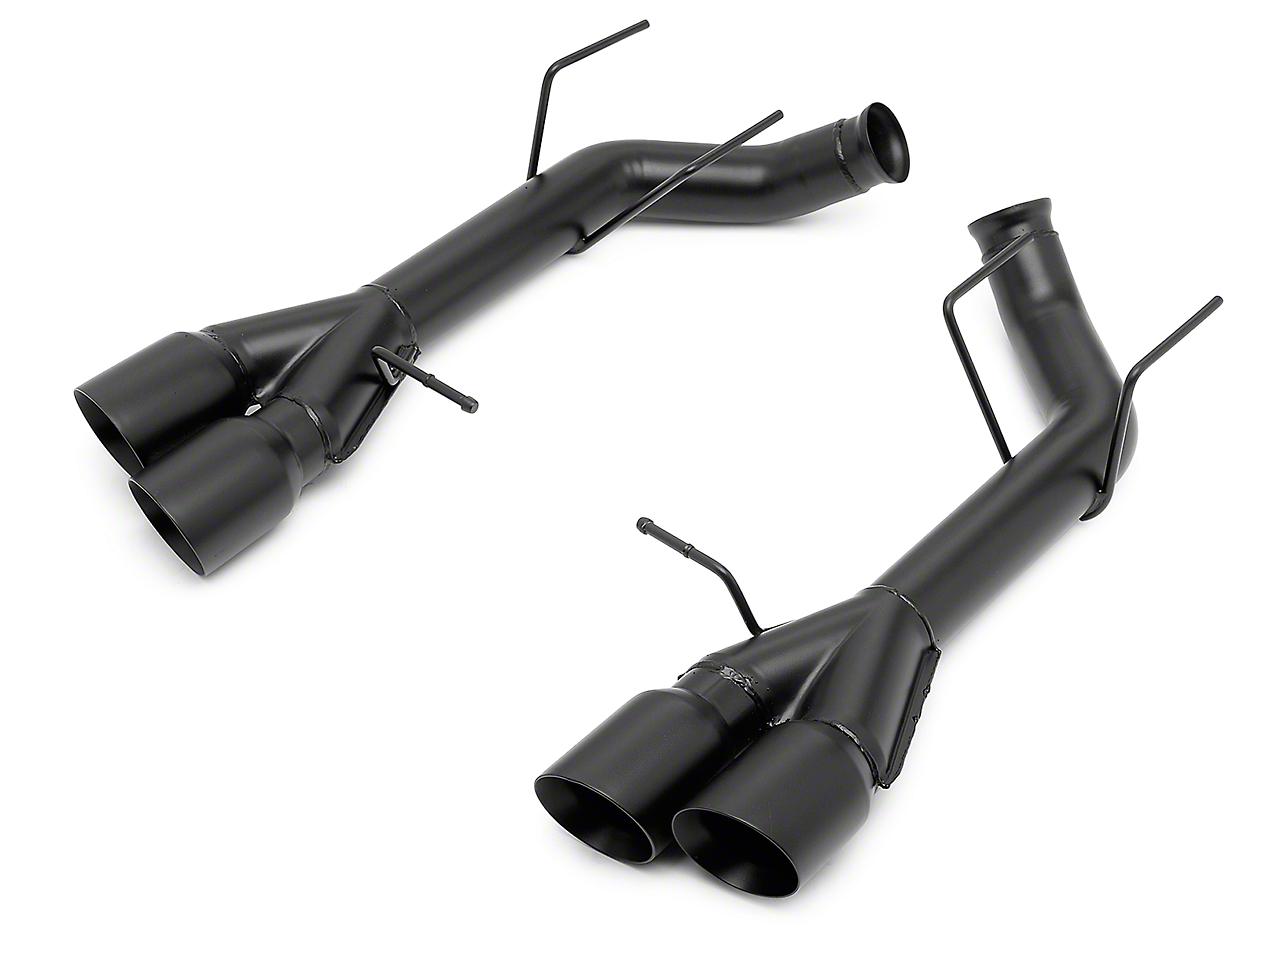 Magnaflow Competition Axle-Back Exhaust w/ Black Quad Tips (13-14 GT500)